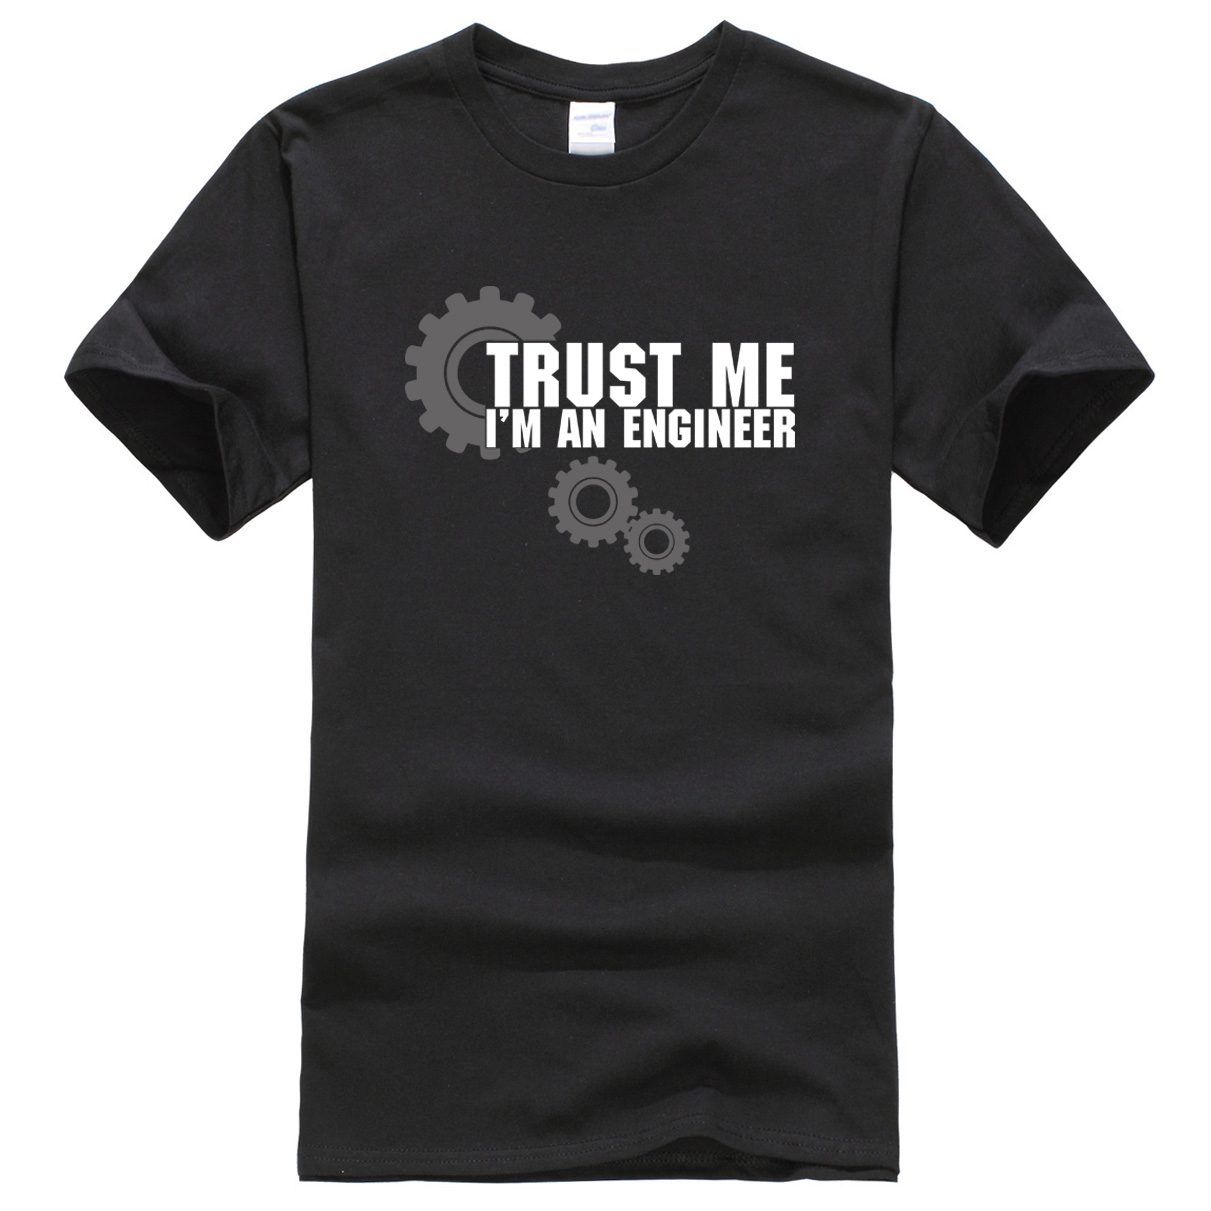 2019 men's T-shirts summer Trust Me I'm An Engineer printed T-shirt men's sportwear hot sale harajuku crossfit tops t shirt